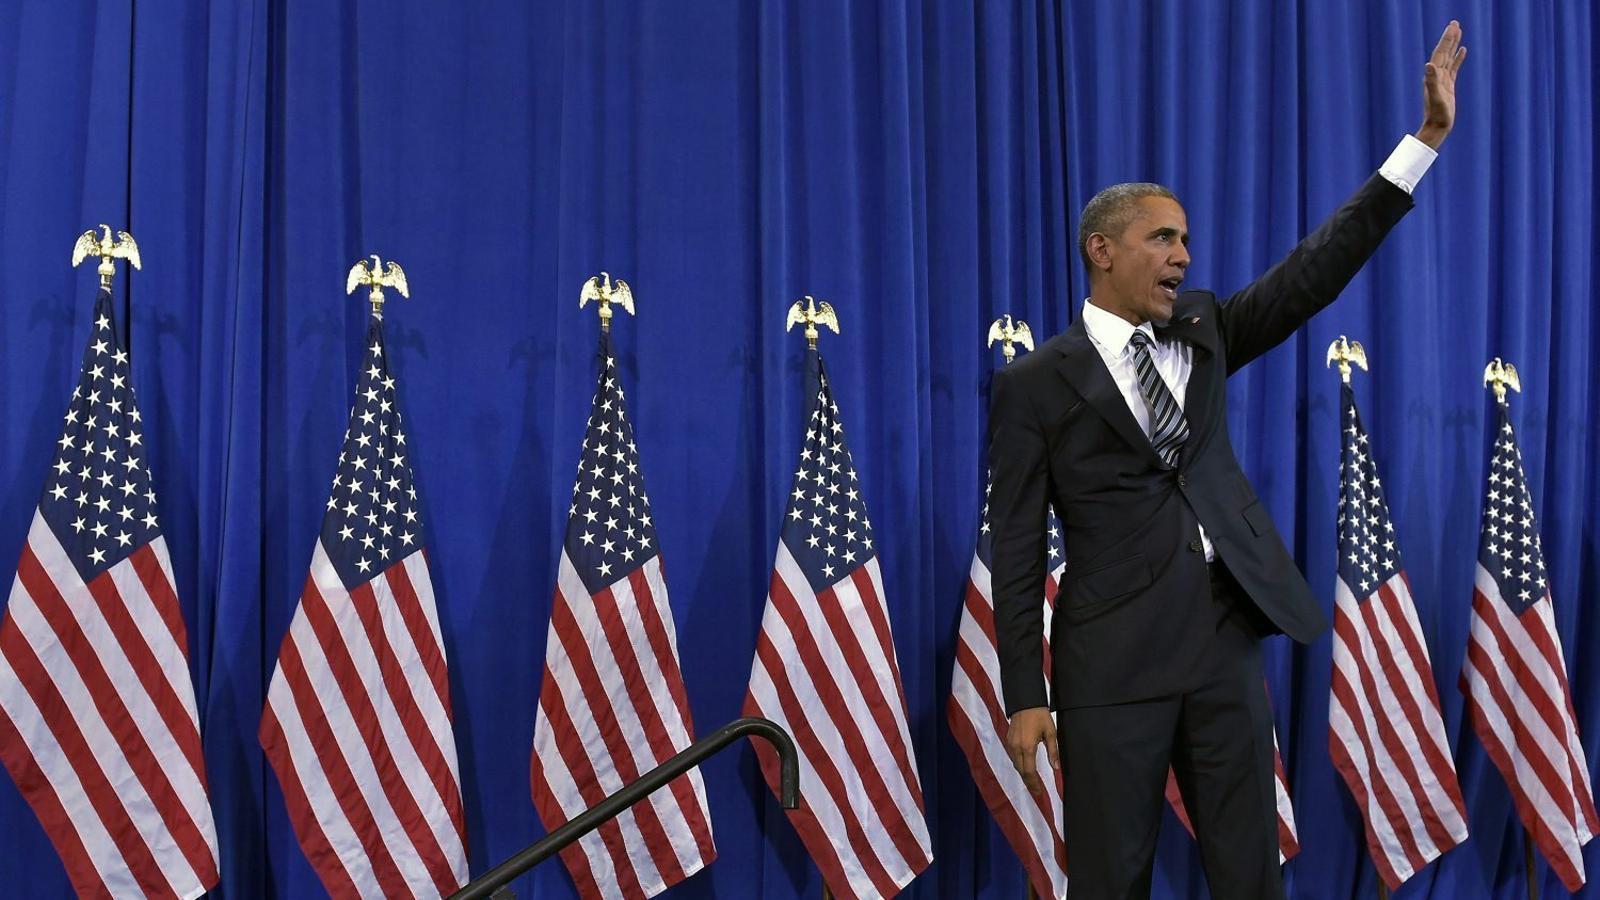 El president Barack Obama va defensar ahir la seva política antiterrorista a la base aèria MacDill, a Tampa, Florida.